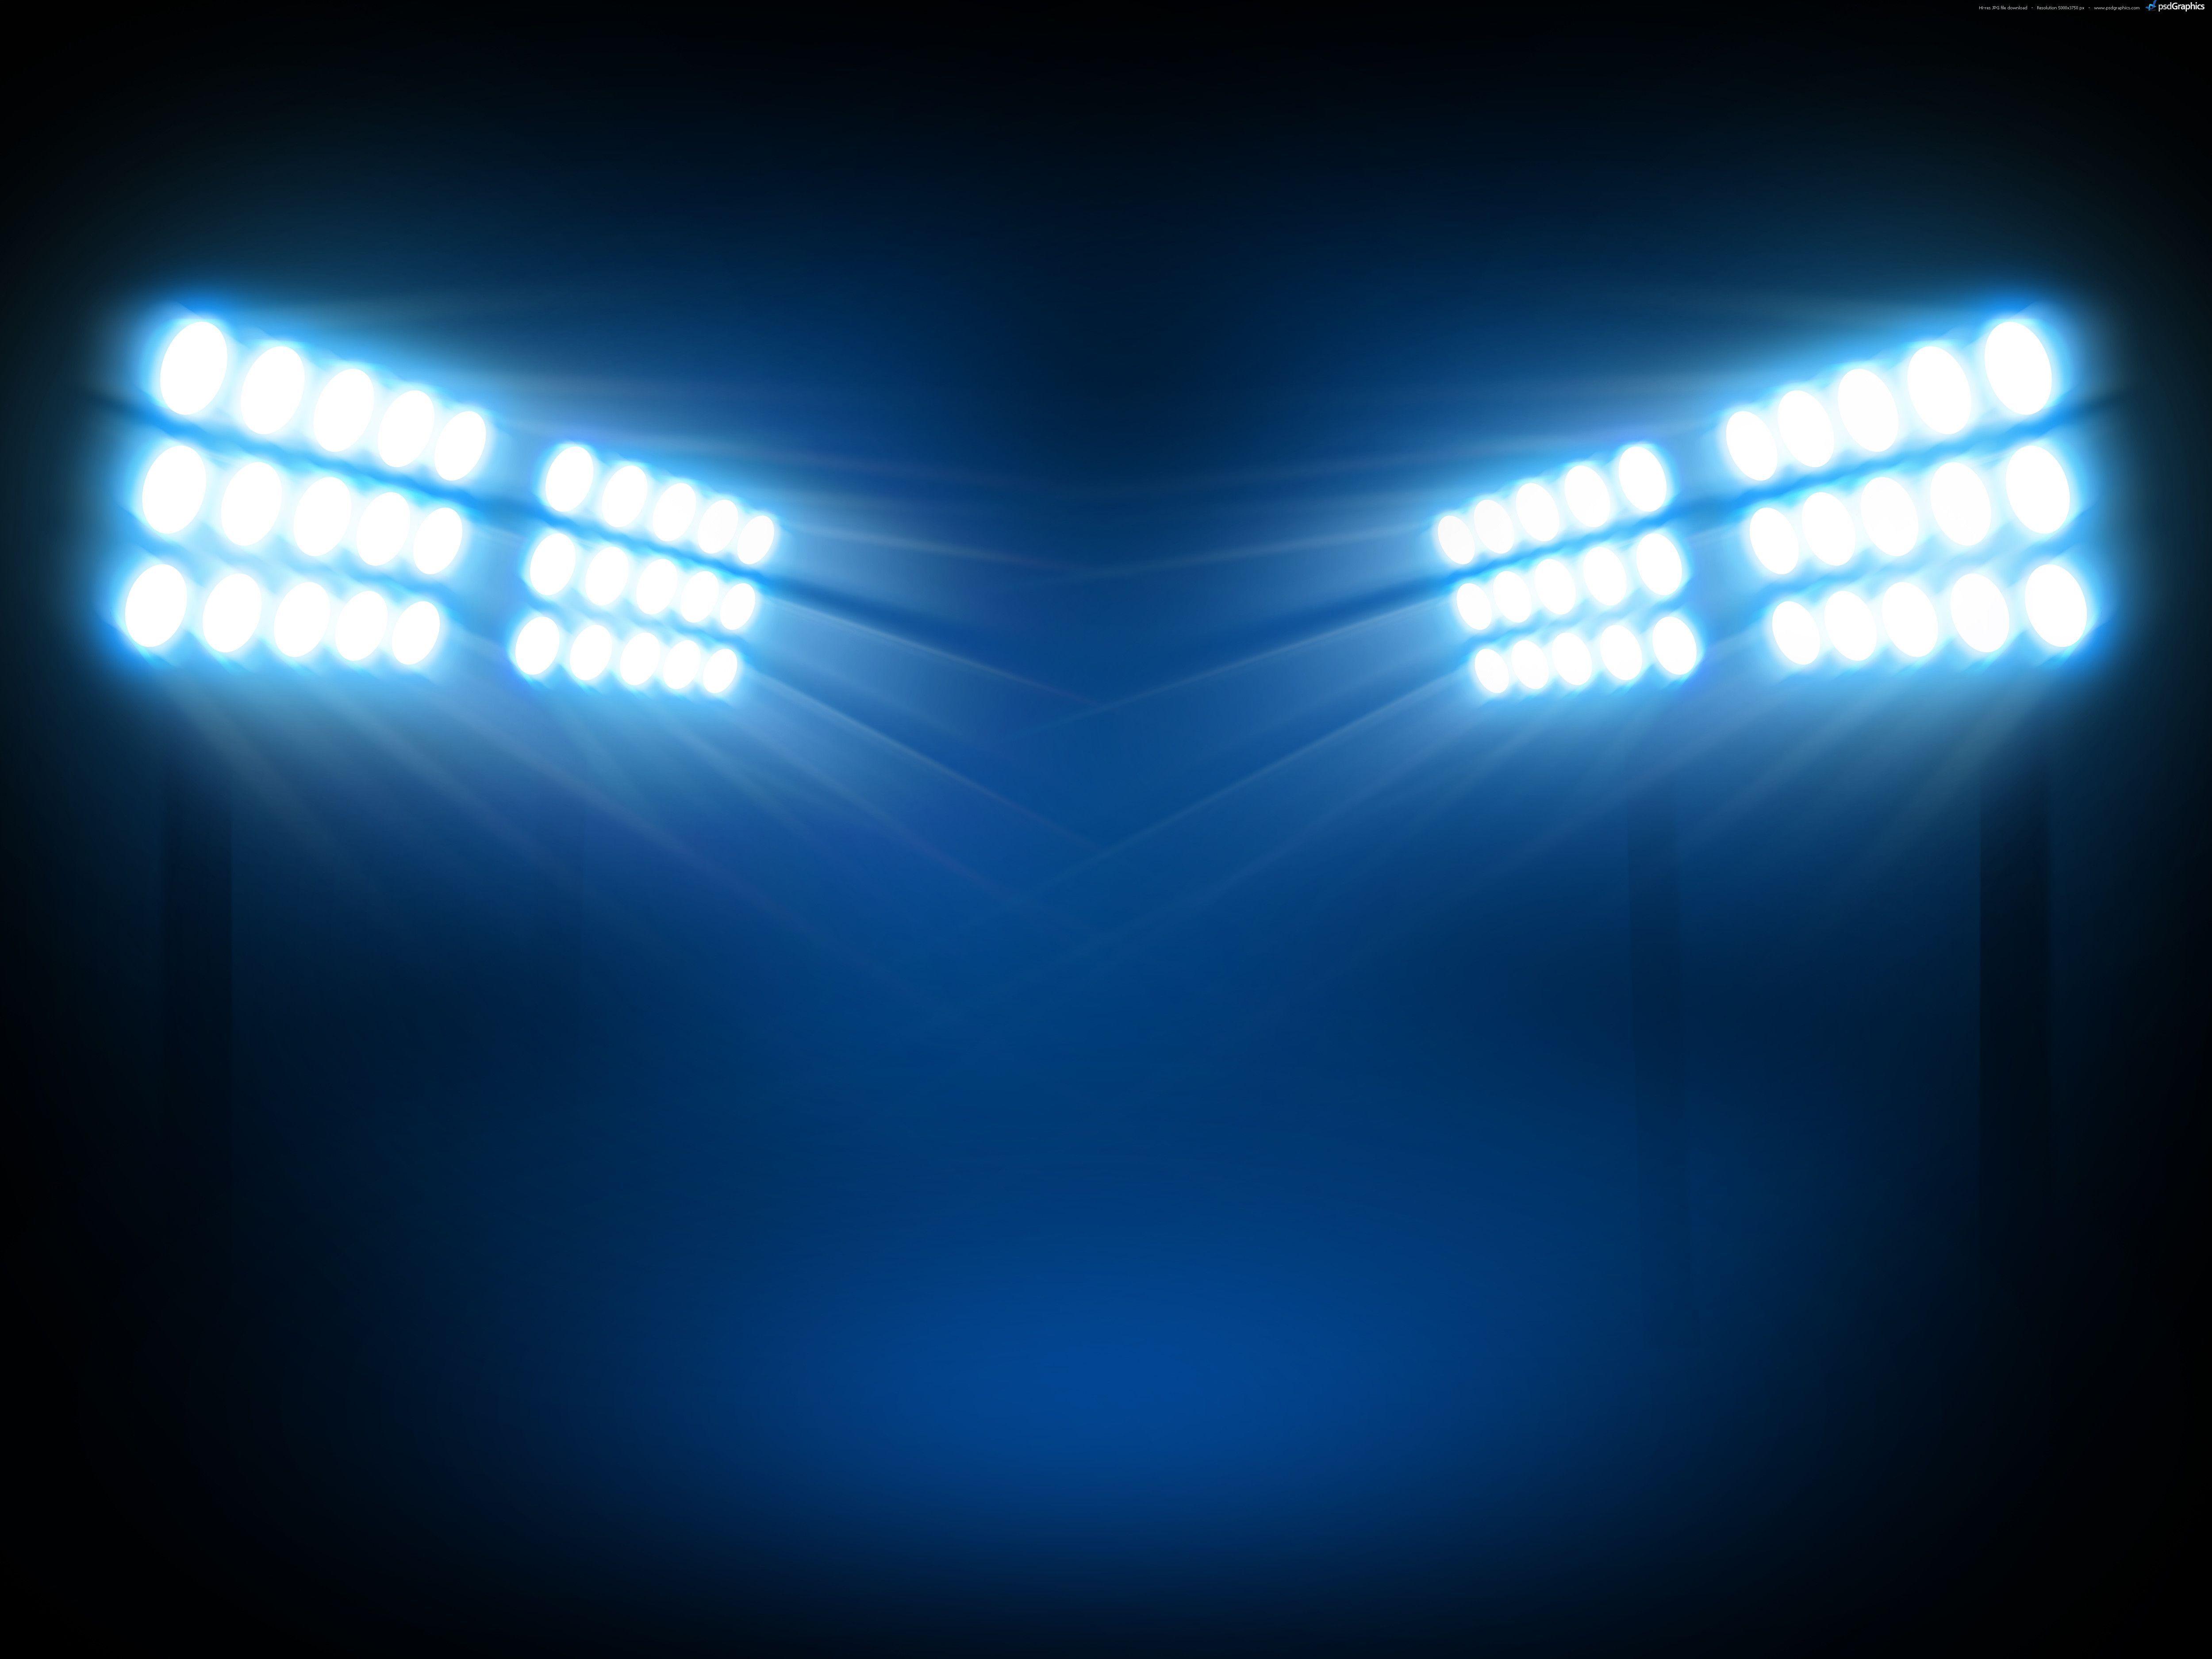 Hpy0ijn Jpg 5000 3750 Stadium Lighting Football Background Flood Lights